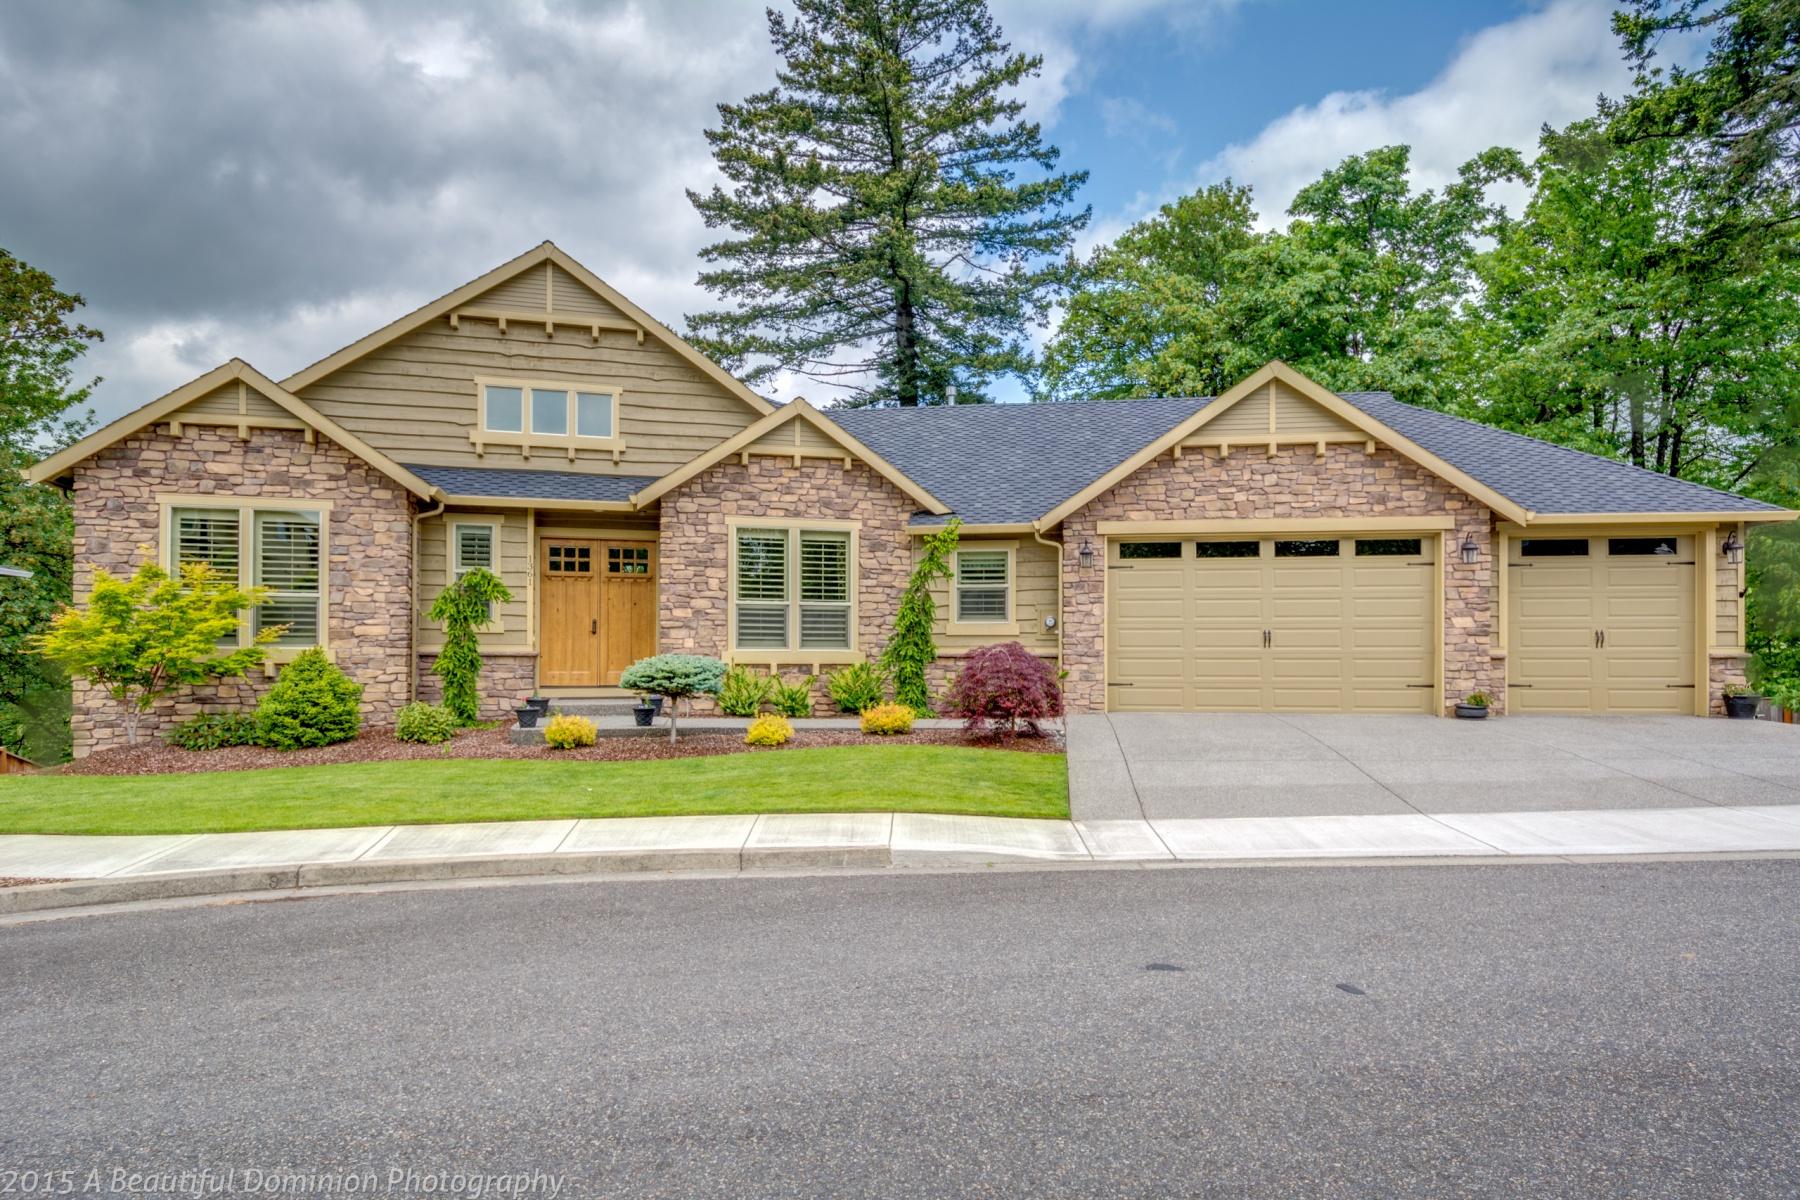 Single Family Home for Sale at 1361 EAGLE ST, CAMAS 1361 NW EAGLE St Camas, Washington 98607 United States